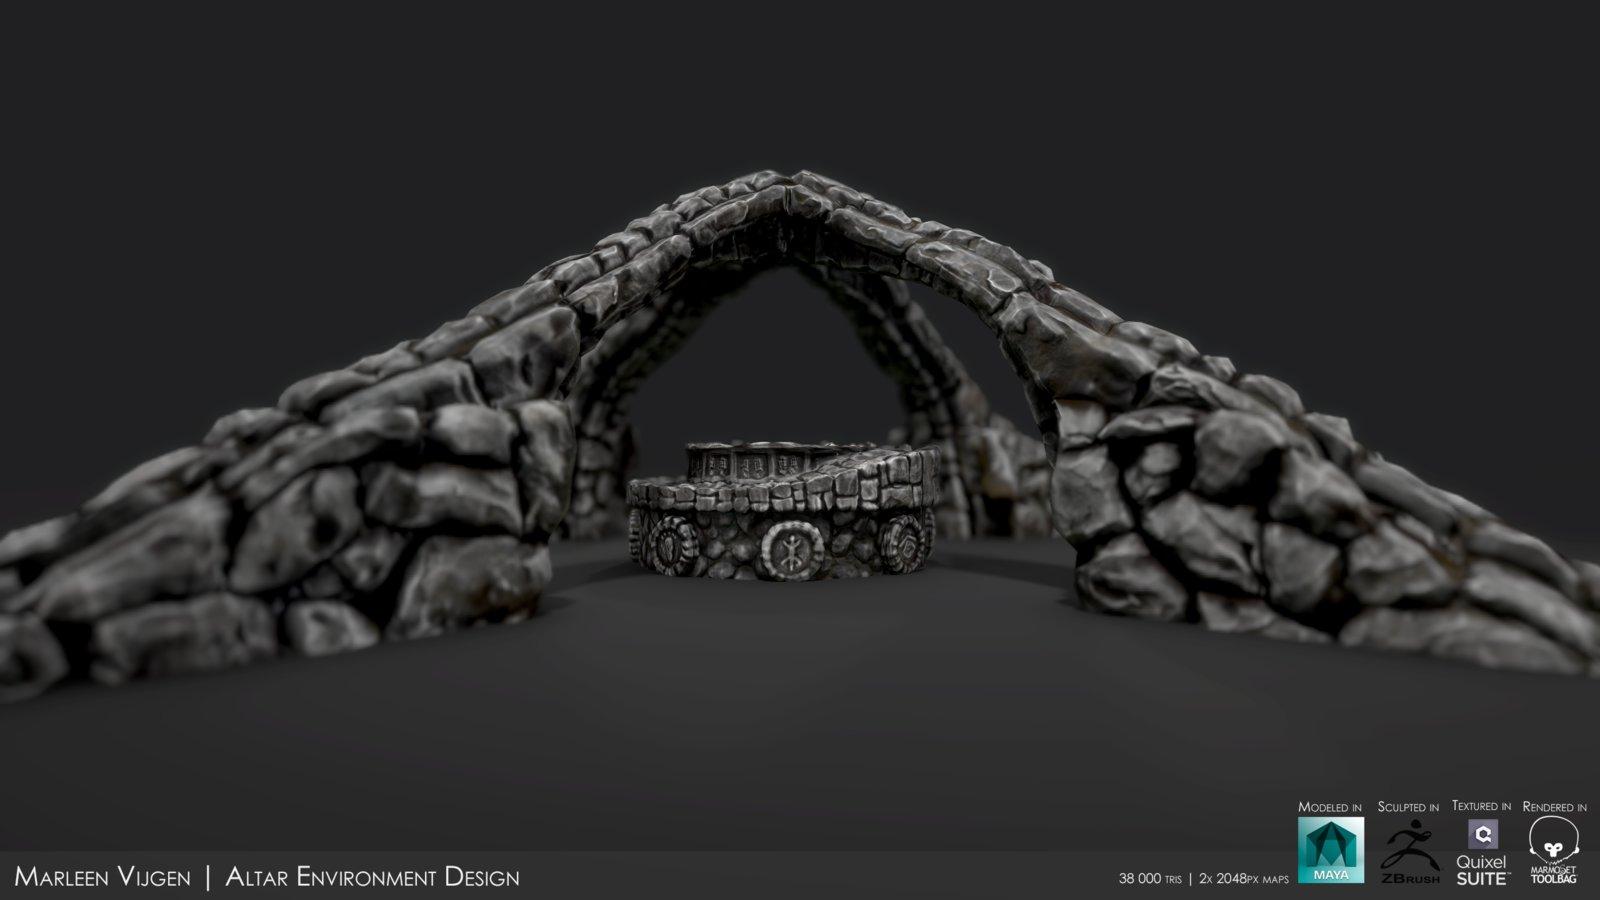 Earth-Altar Environment Design